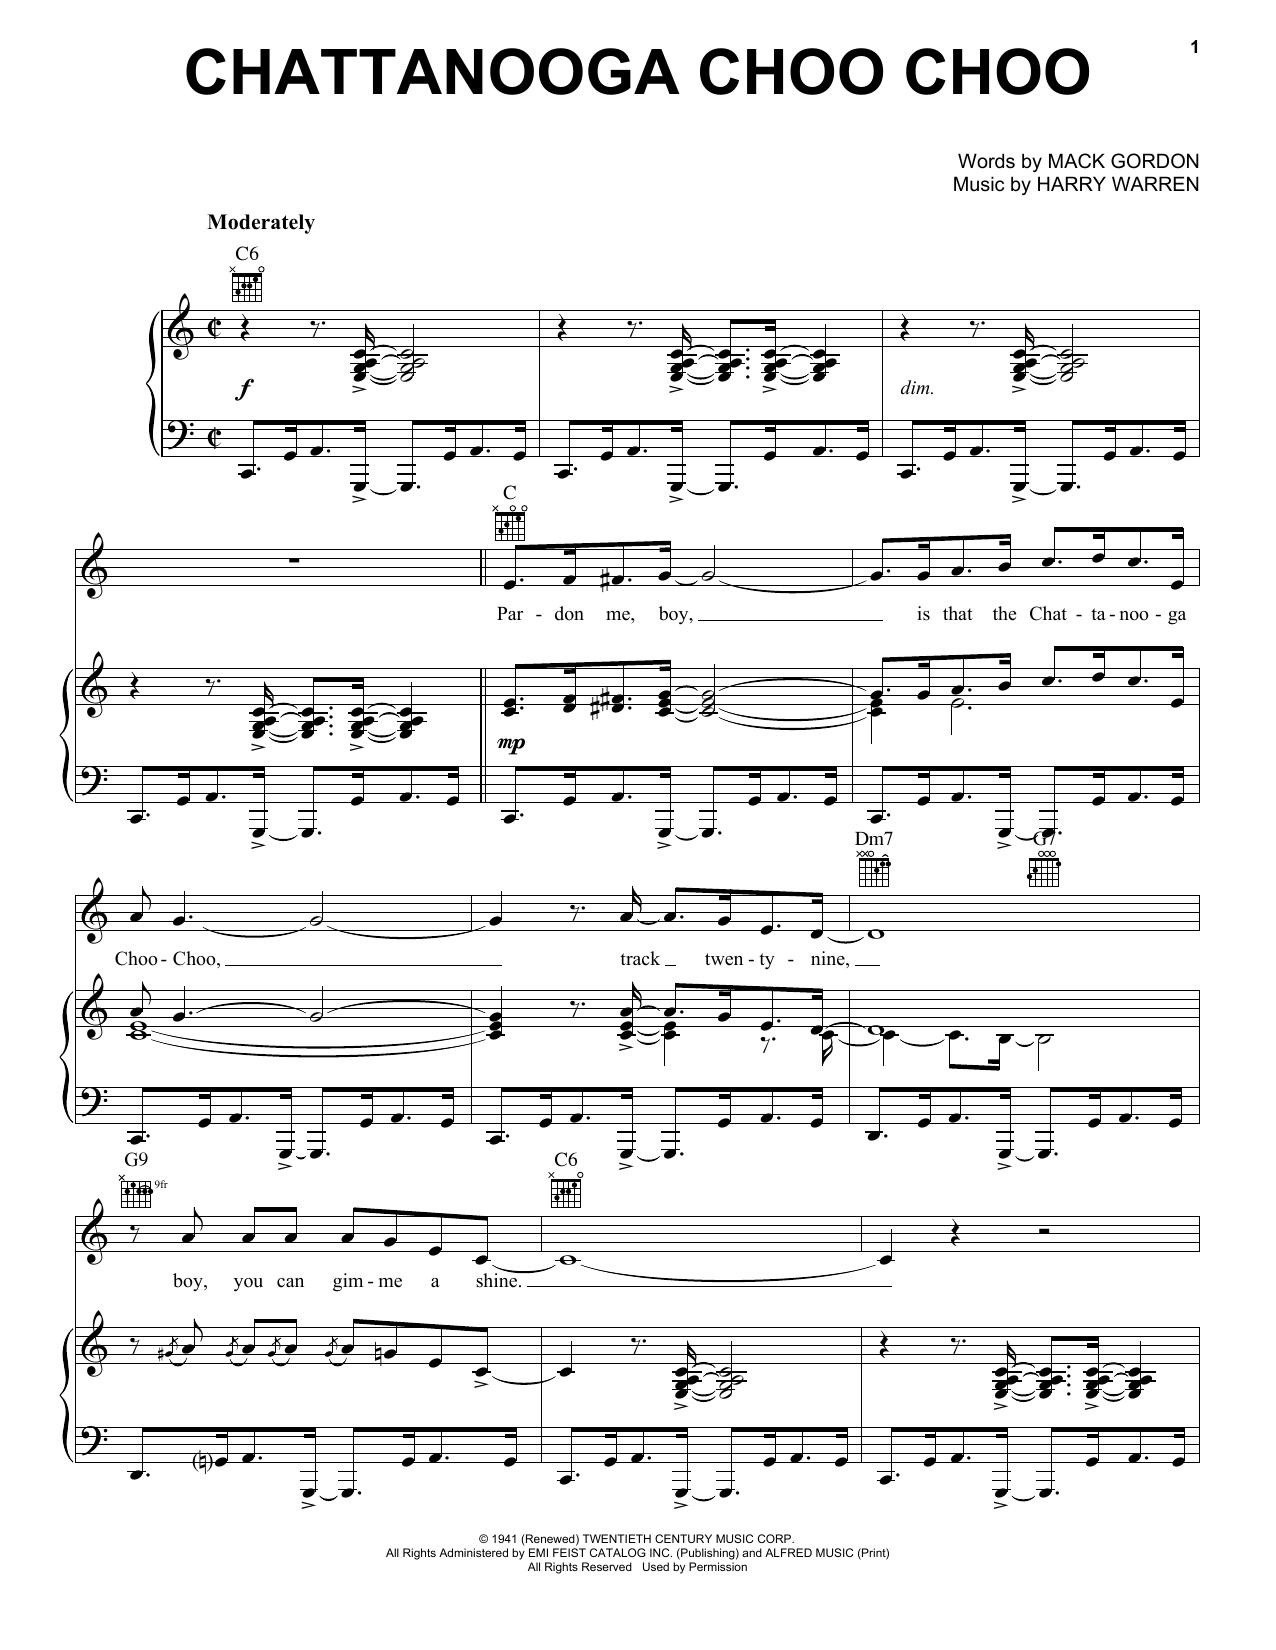 Glenn Miller Chattanooga Choo Choo sheet music notes and chords